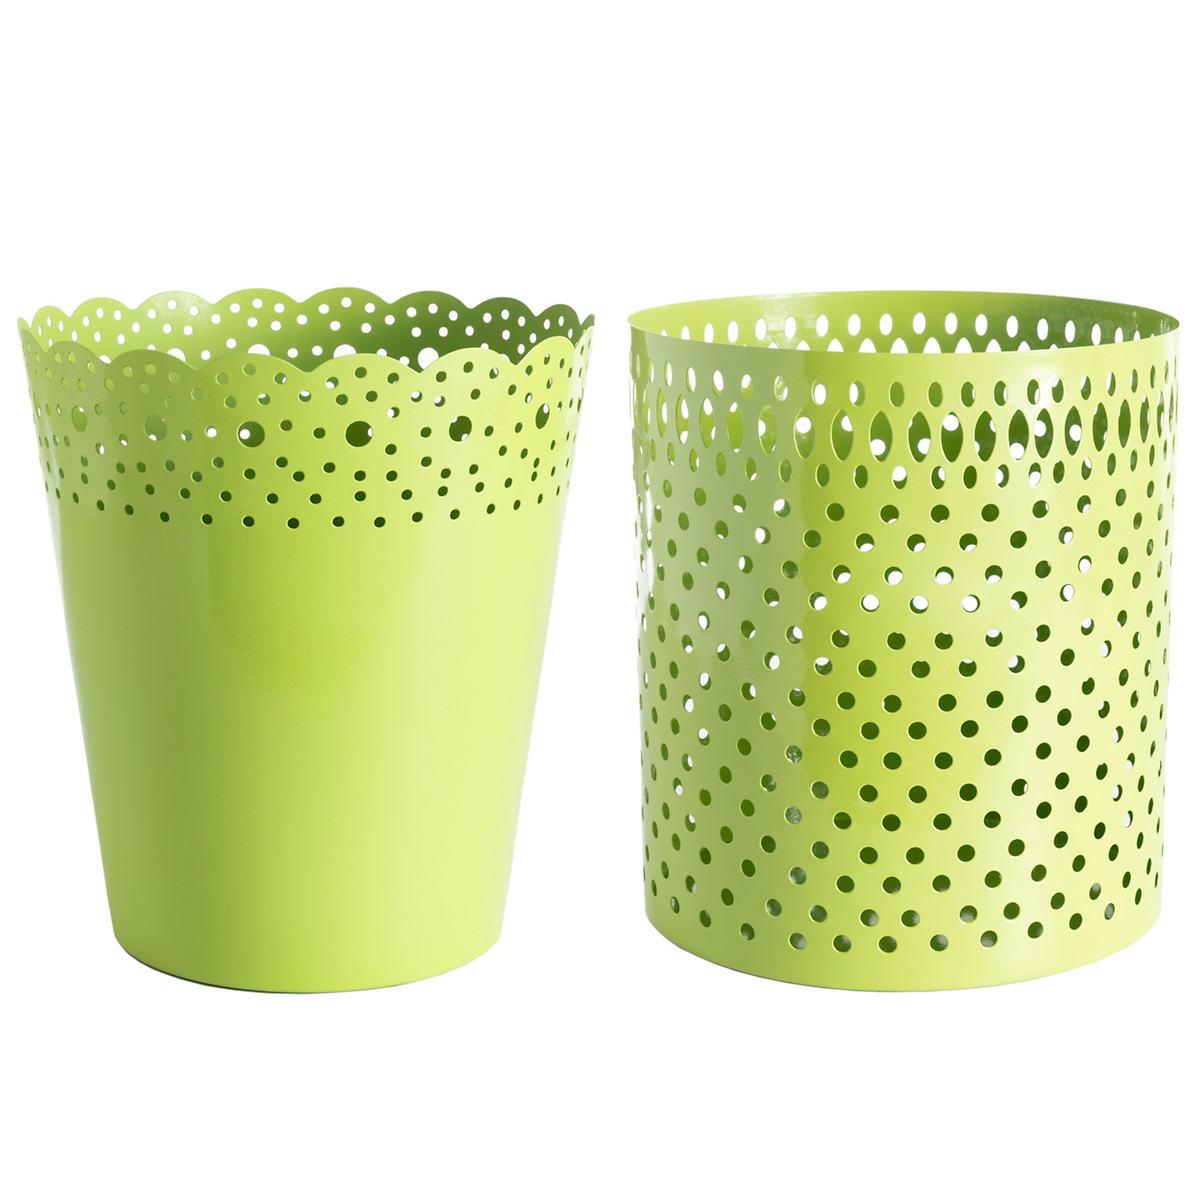 Dottie Green Wastebasket